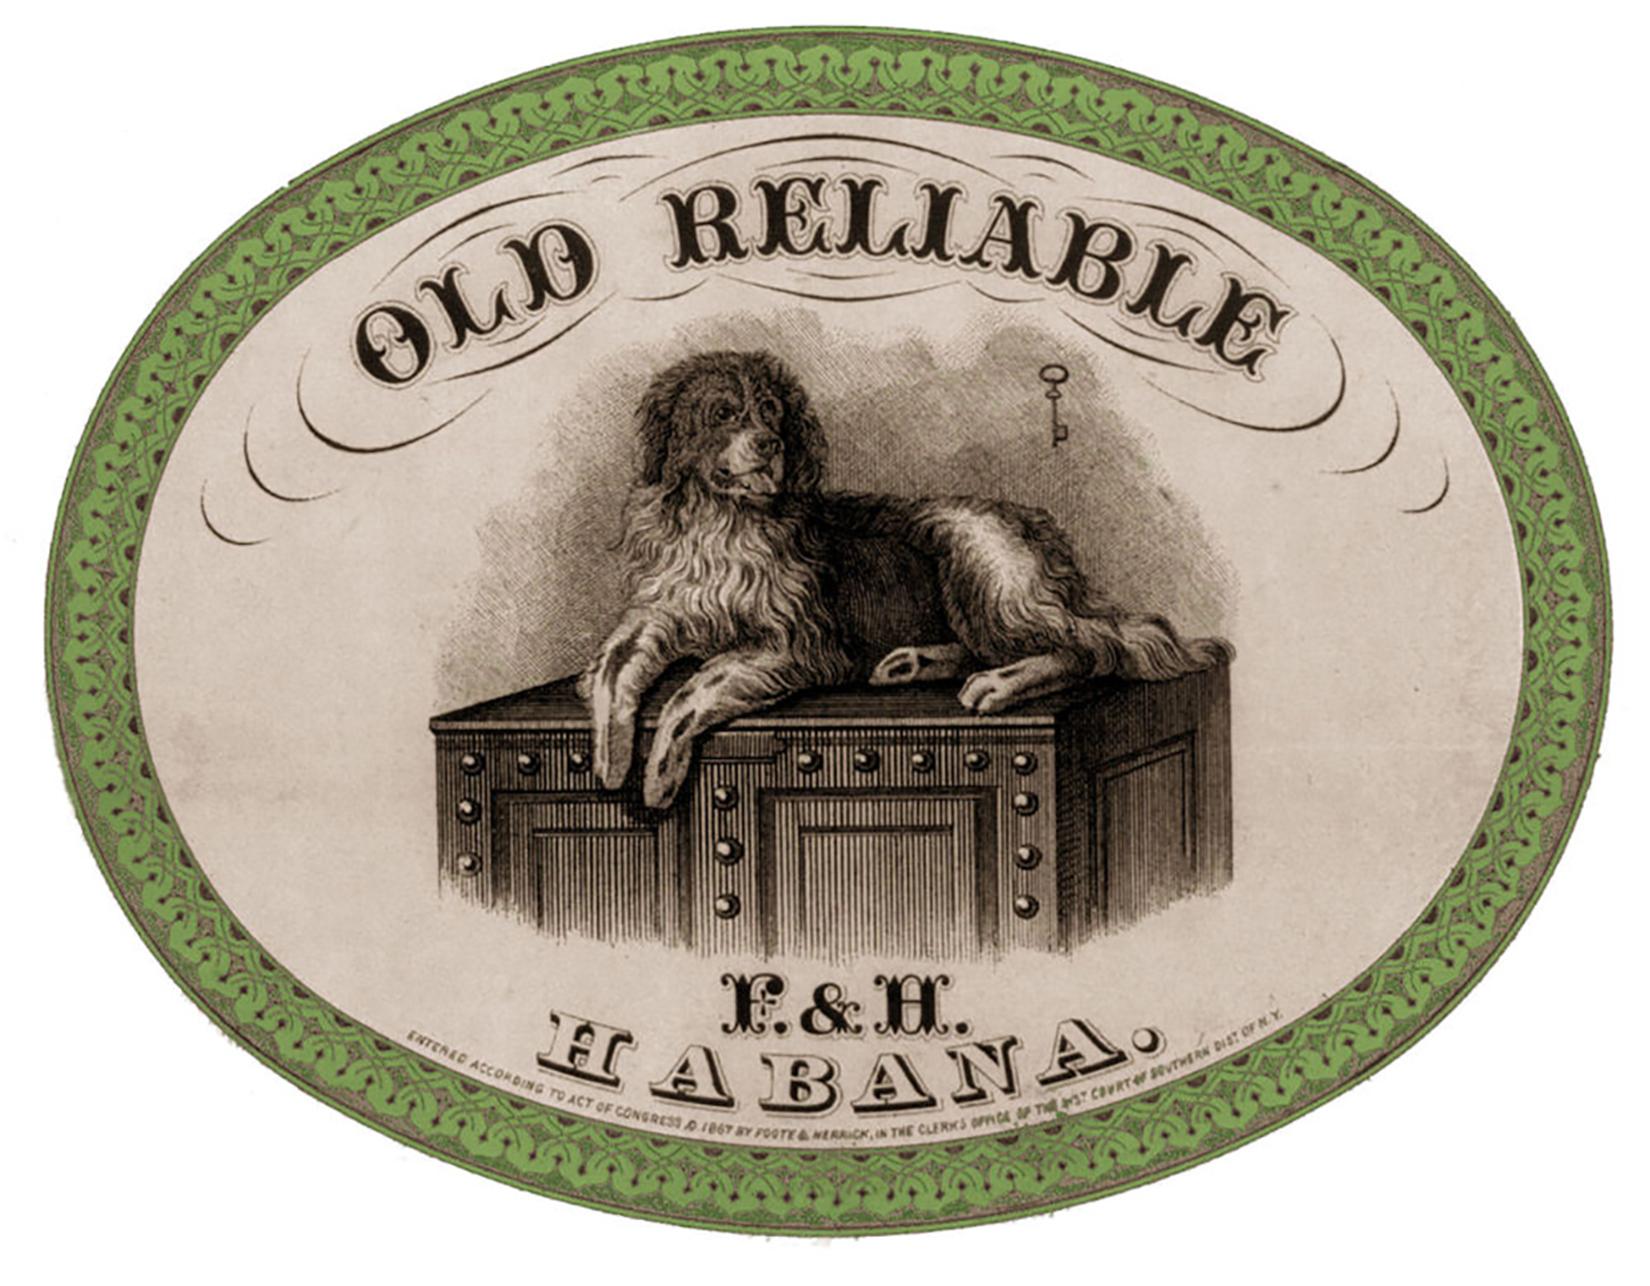 Dog-Cigar-Label-GraphicsFairy